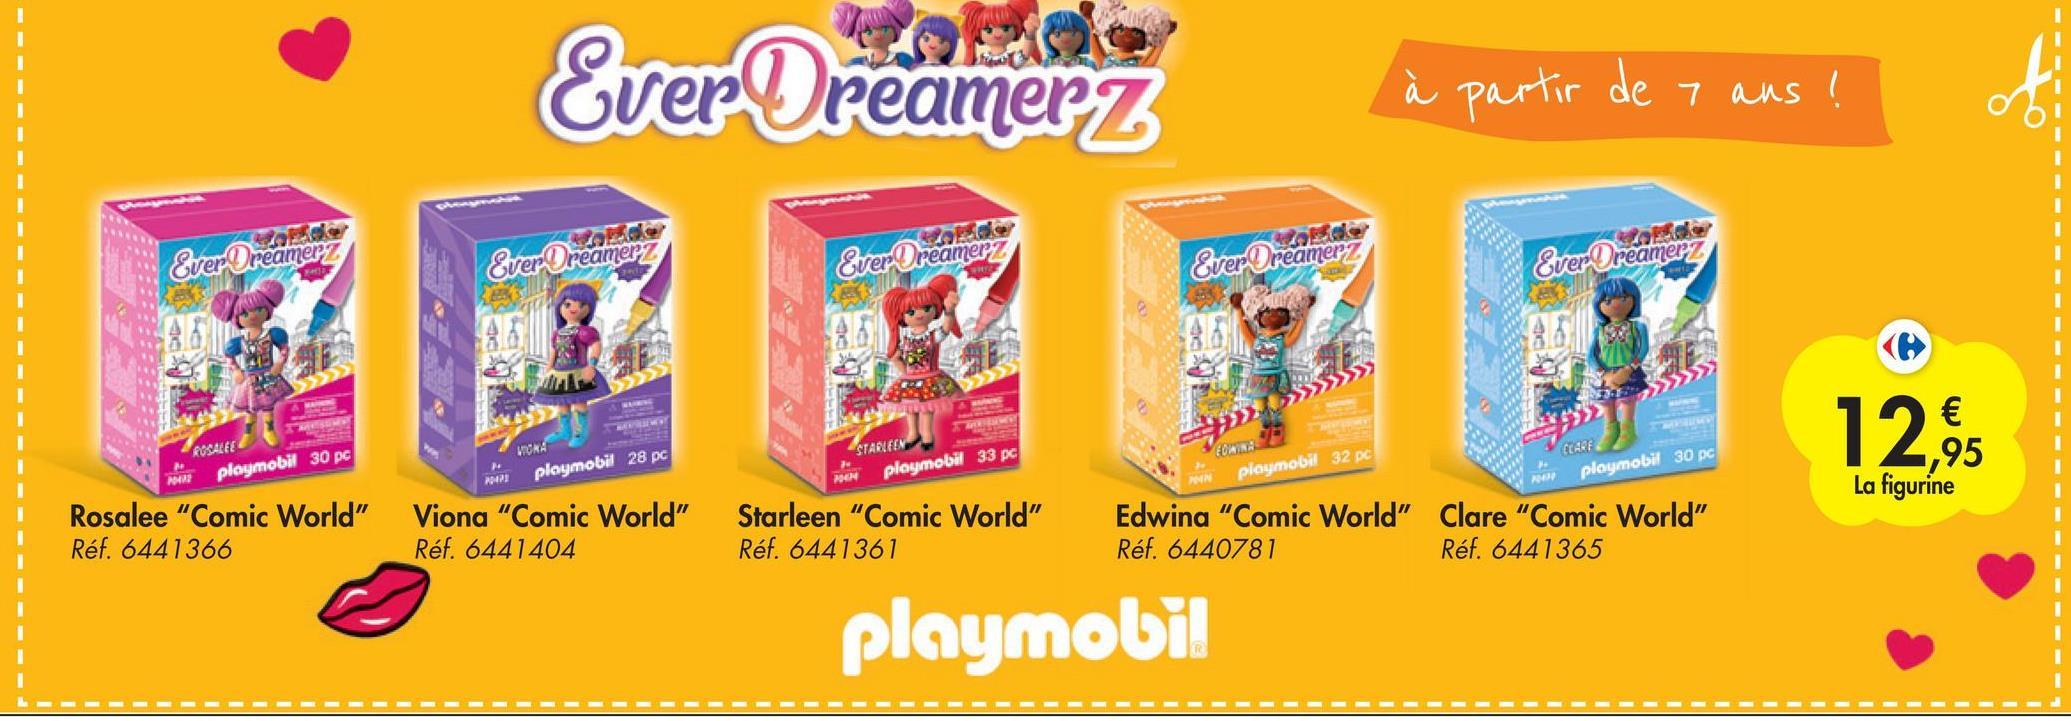 "Ever Dreamerz à partir de 7 ans ! Ever Oreamery Ever Oreamerz Ever Orea reamerz Ever Oreamerz Ever Oreamery 66 86 86 ROSALEE playmobil 30 pc STARLEEN playmobil 33 pc playmobil 28 pc € ,95 La figurine CARF playmobil 30 pc playmobil 32 pc MOON AN Rosalee ""Comic World"" Réf. 6441366 Viona ""Comic World"" Réf. 6441404 Starleen ""Comic World"" Réf. 6441361 Edwina ""Comic World"" Clare ""Comic World"" Réf. 6440781 Réf. 6441365 playmobil"